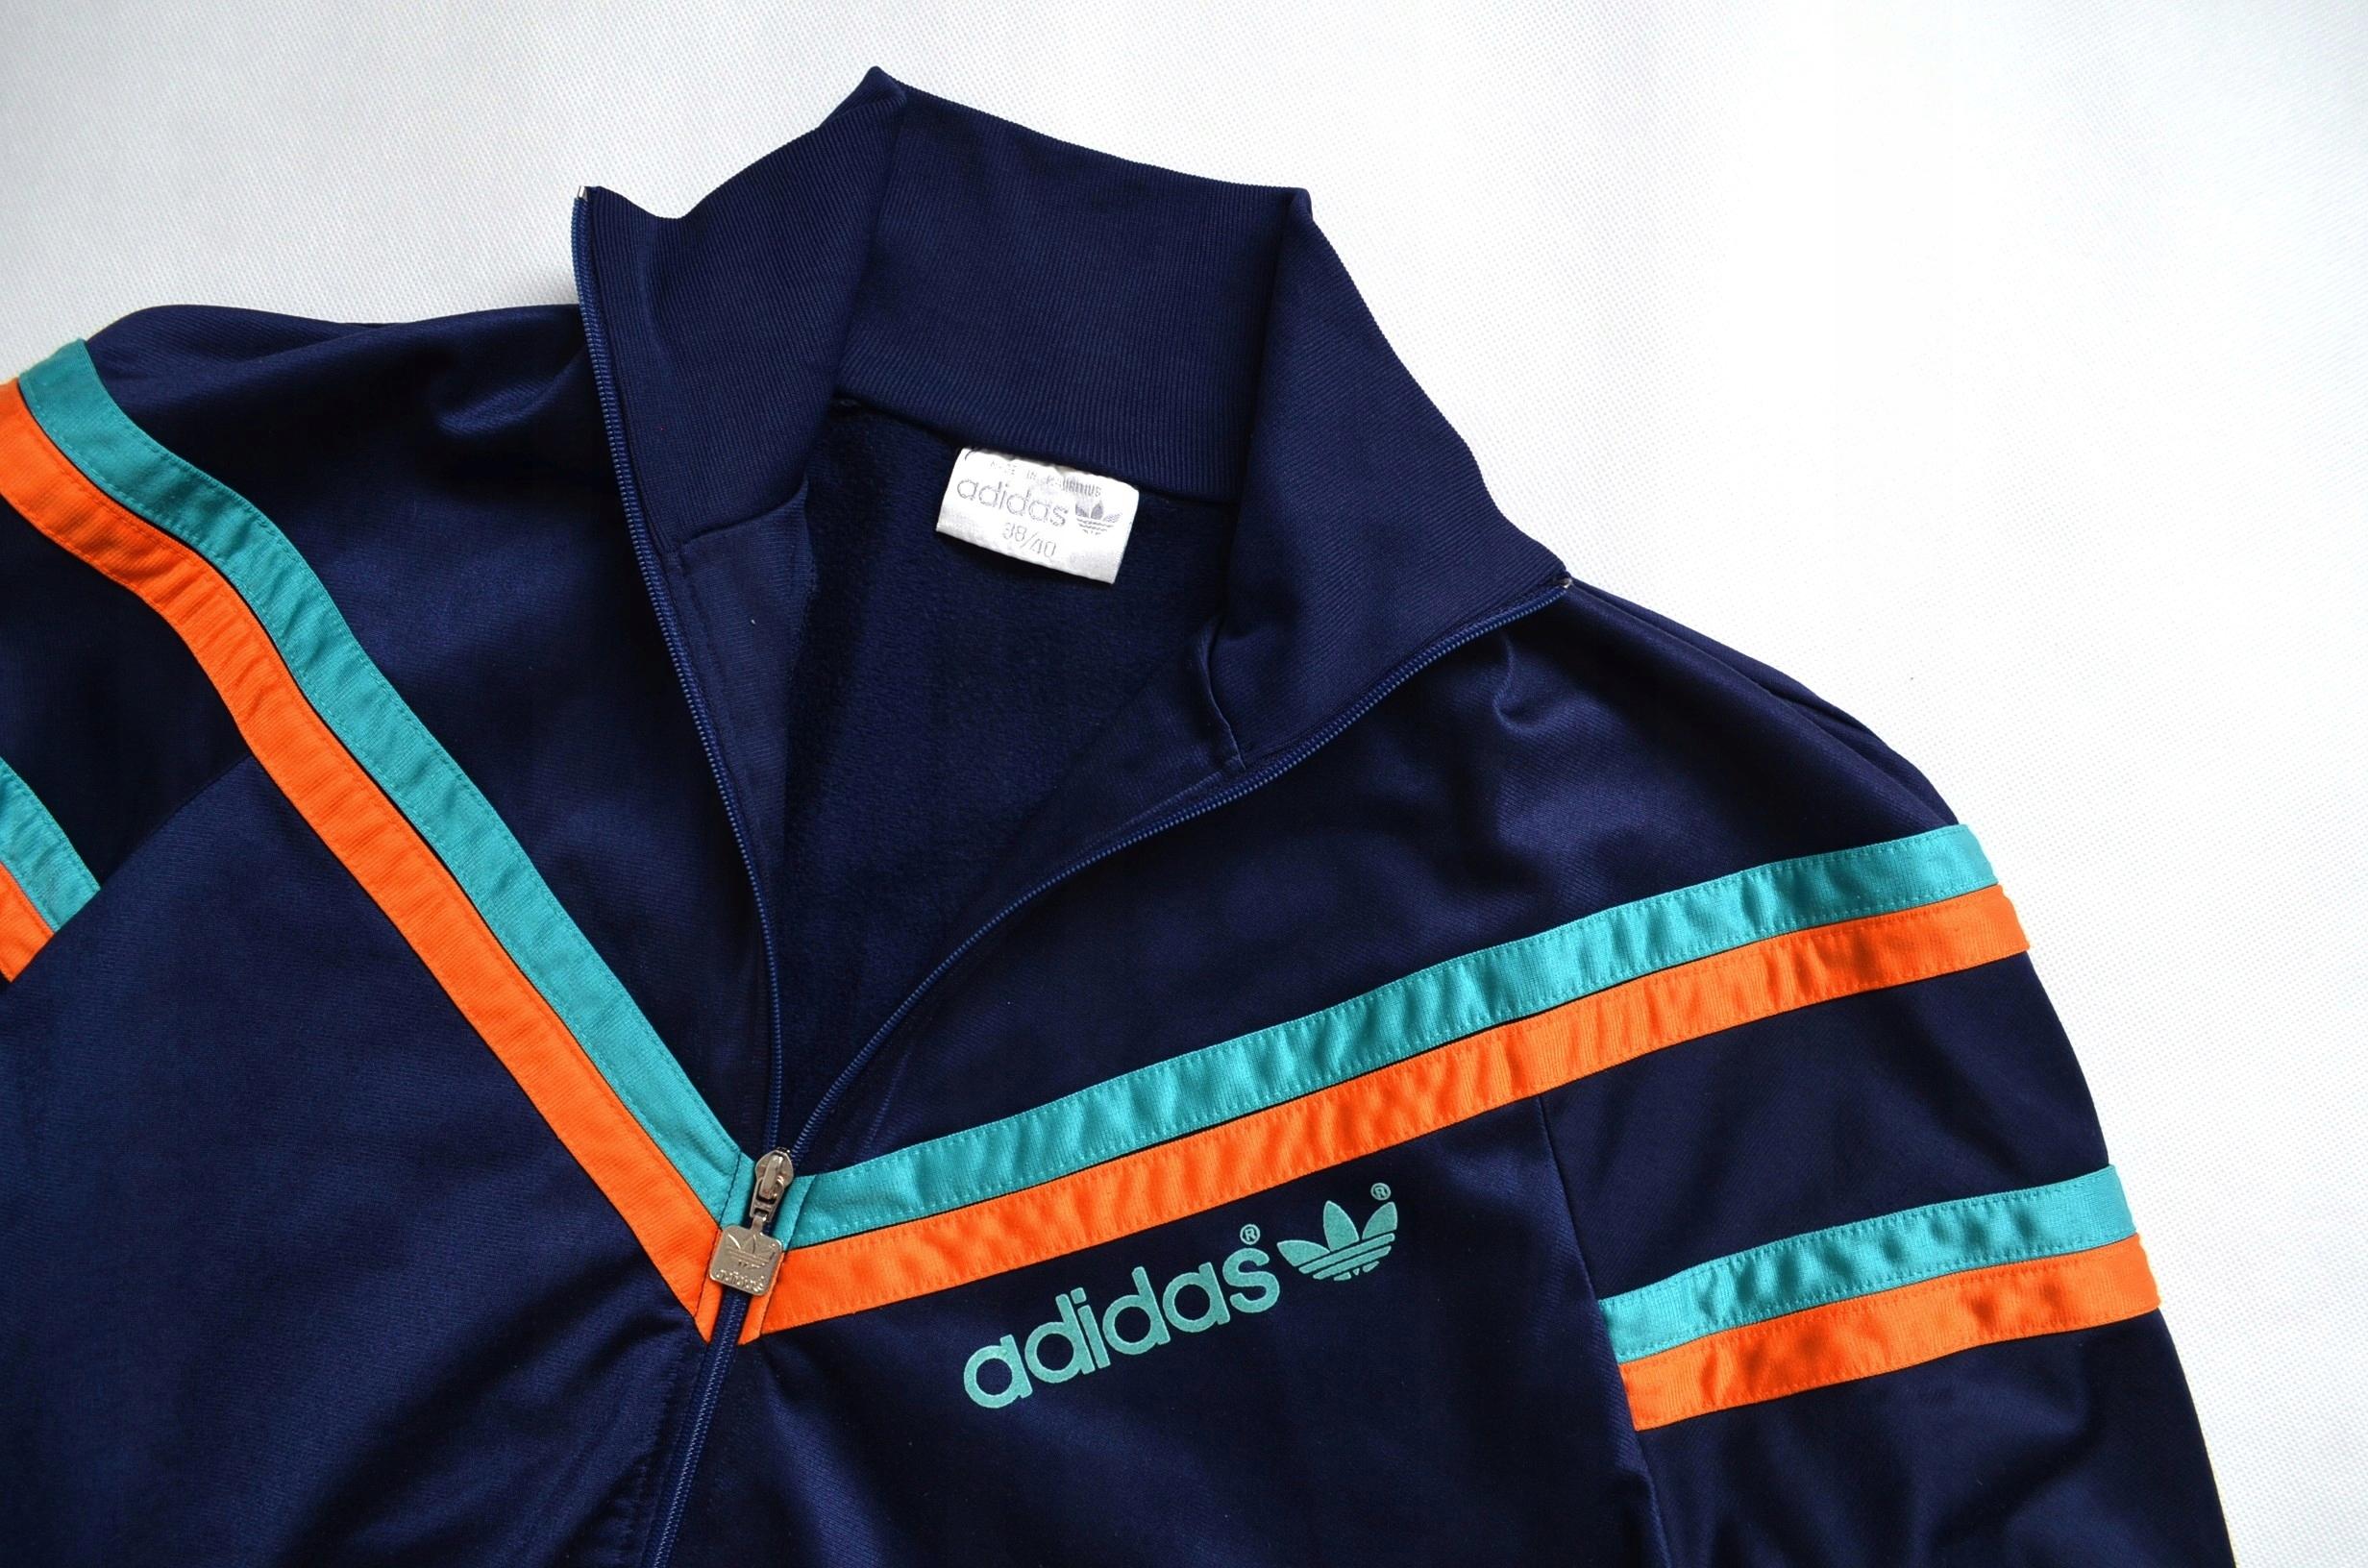 ADIDAS męska sportowa oldschool retro bluza r. ML